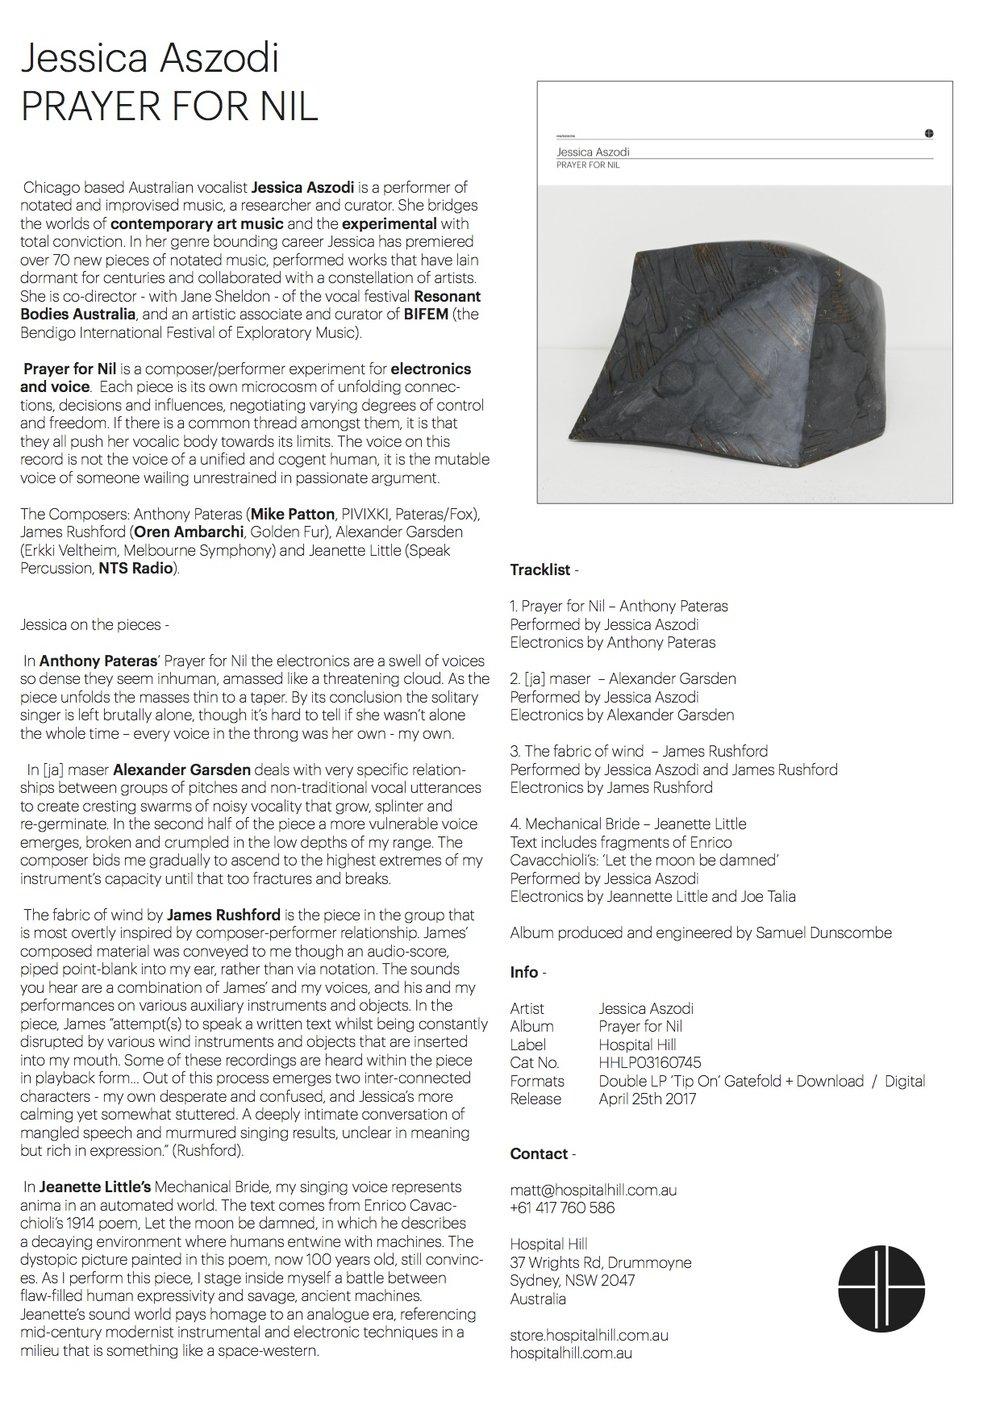 Jessica Aszodi One Sheet 030117.jpg